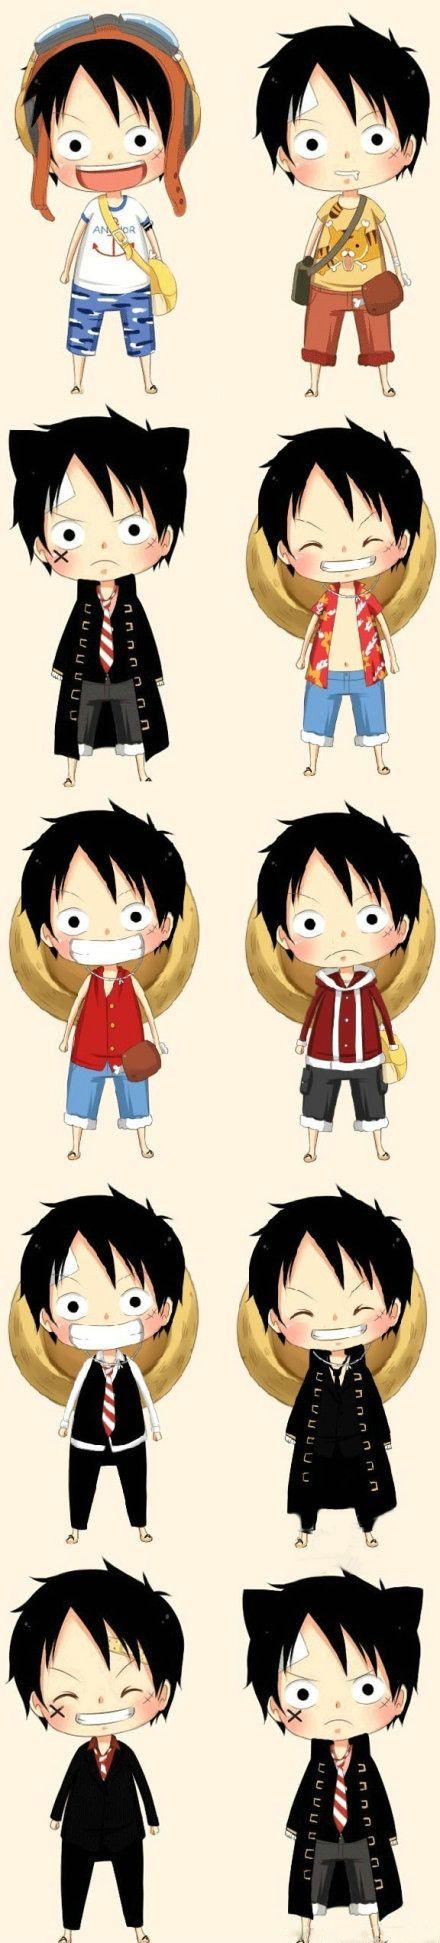 Small Luffy<3<3<3 | One piece | Monkey·D·Luffy #Anime #onepiece #luffy